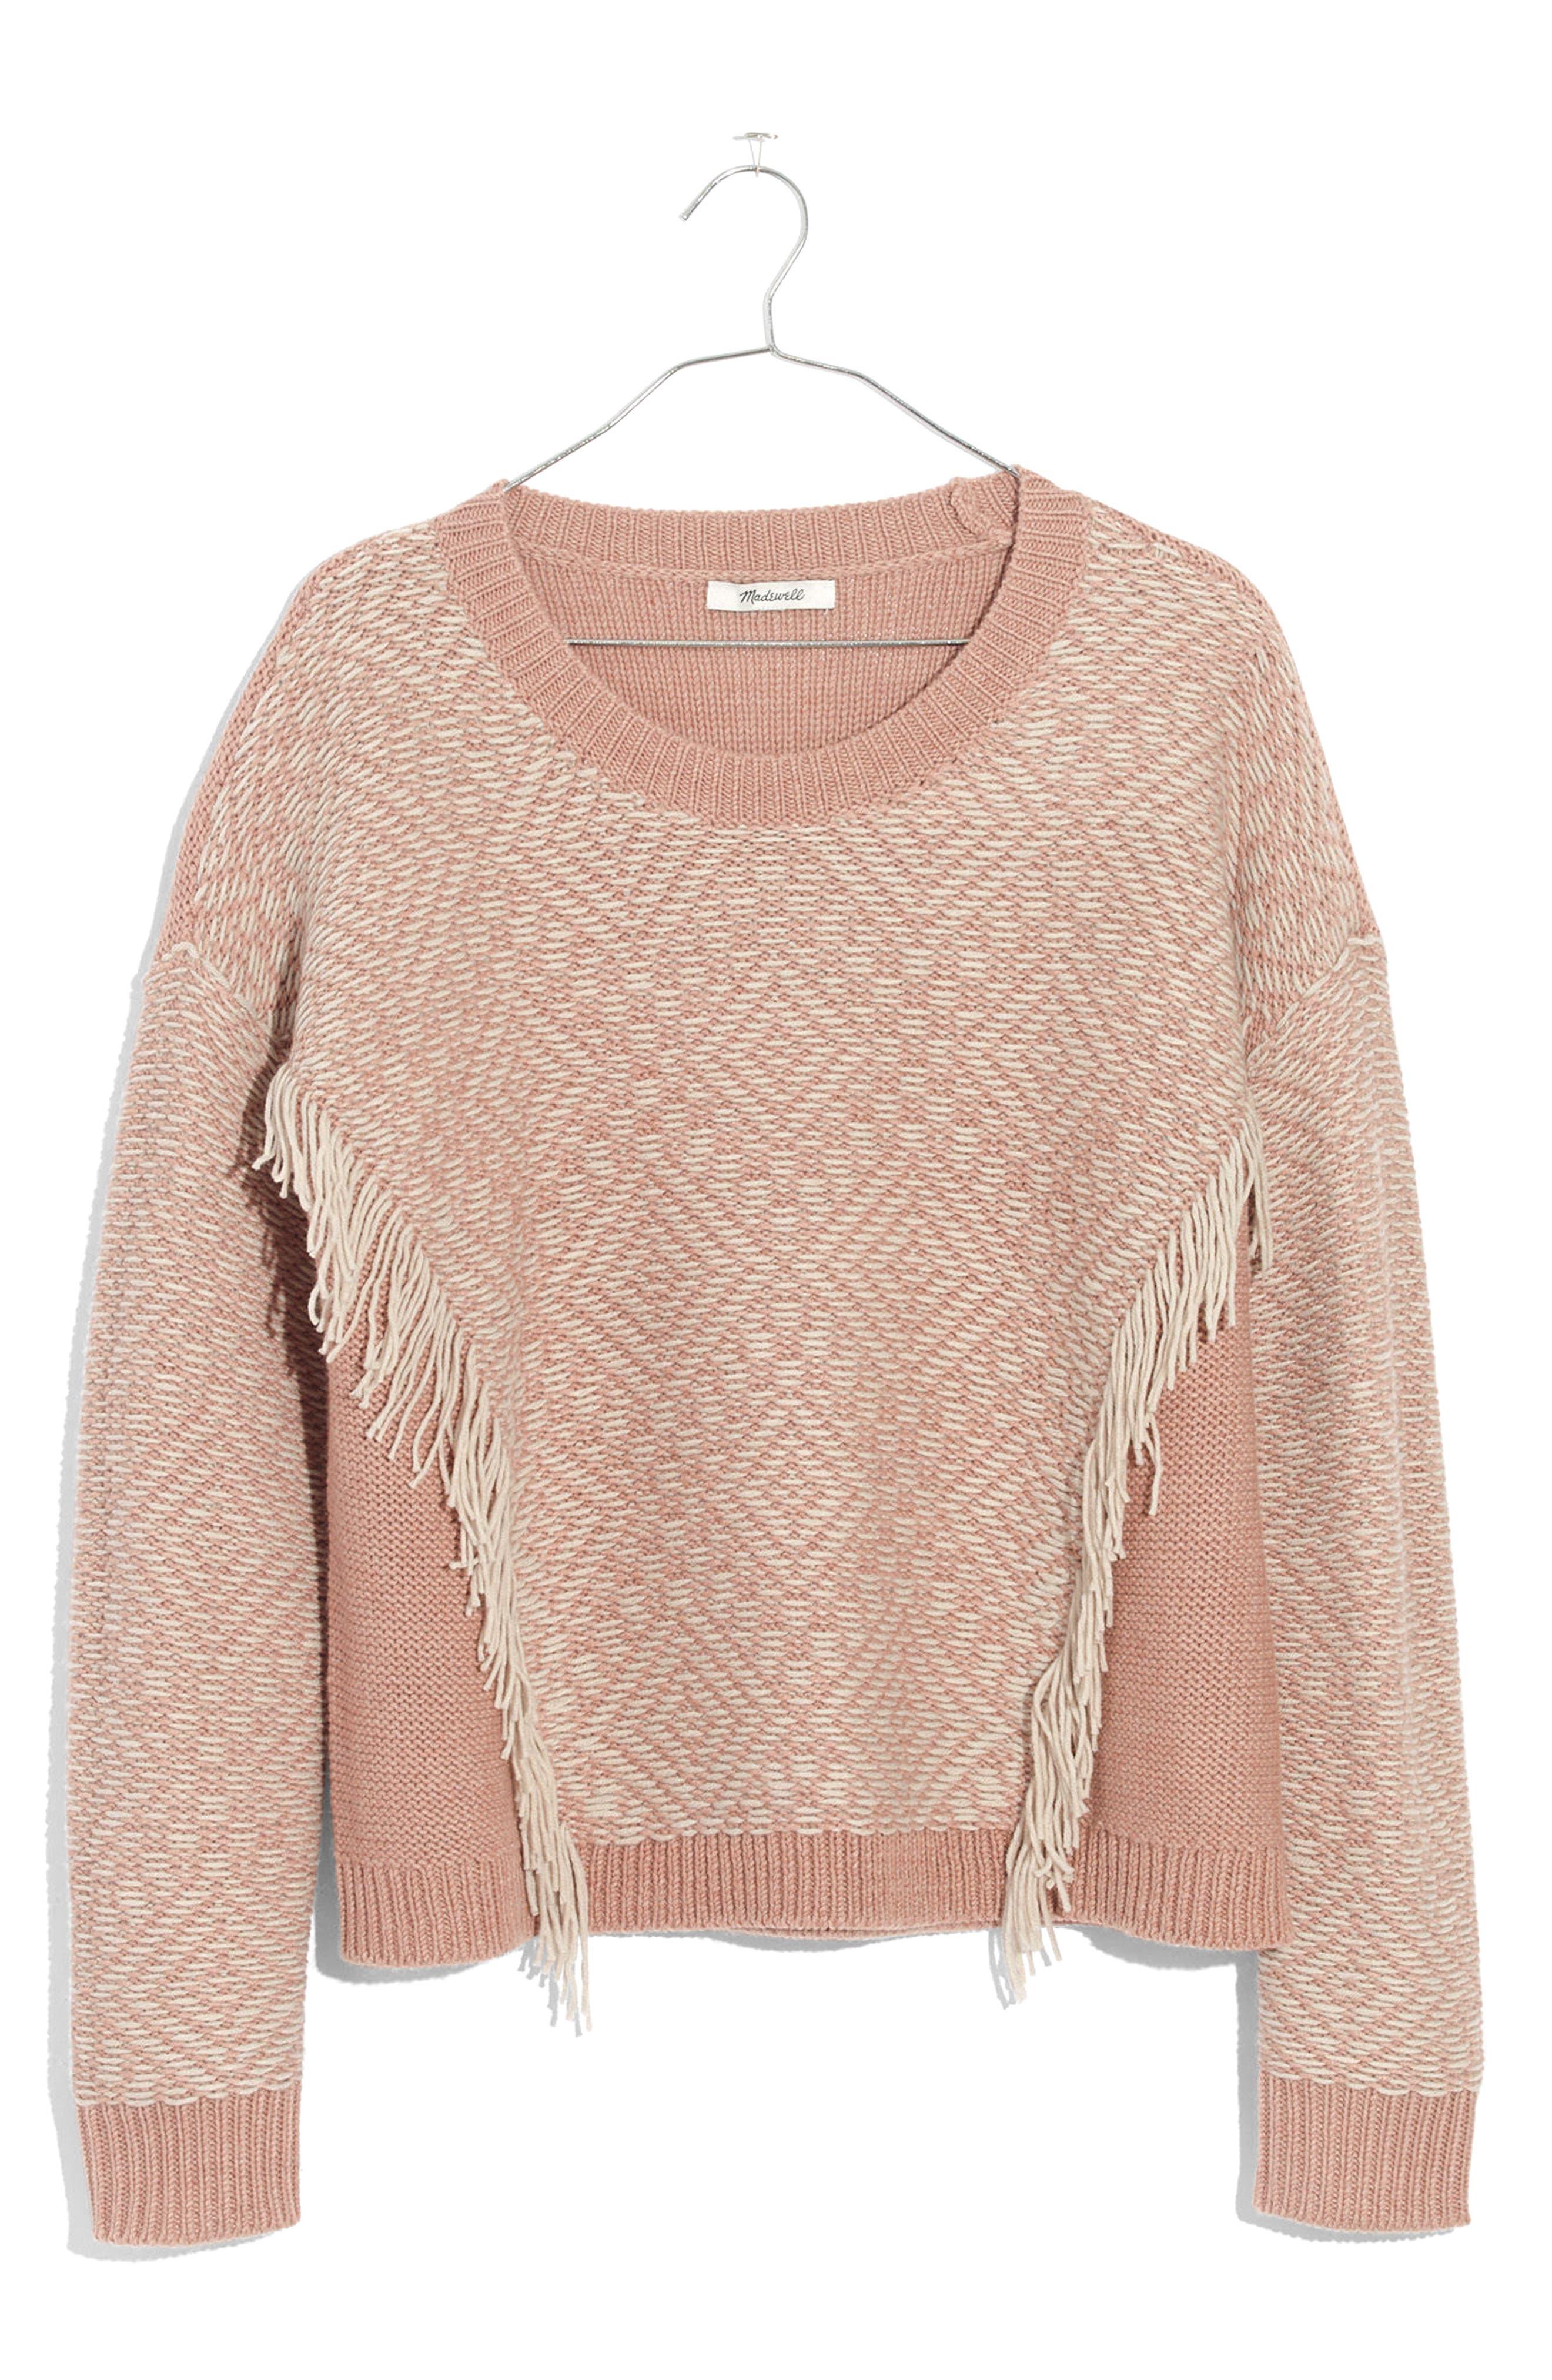 Reverse Diamond Pullover Sweater,                             Alternate thumbnail 3, color,                             Heather Voile